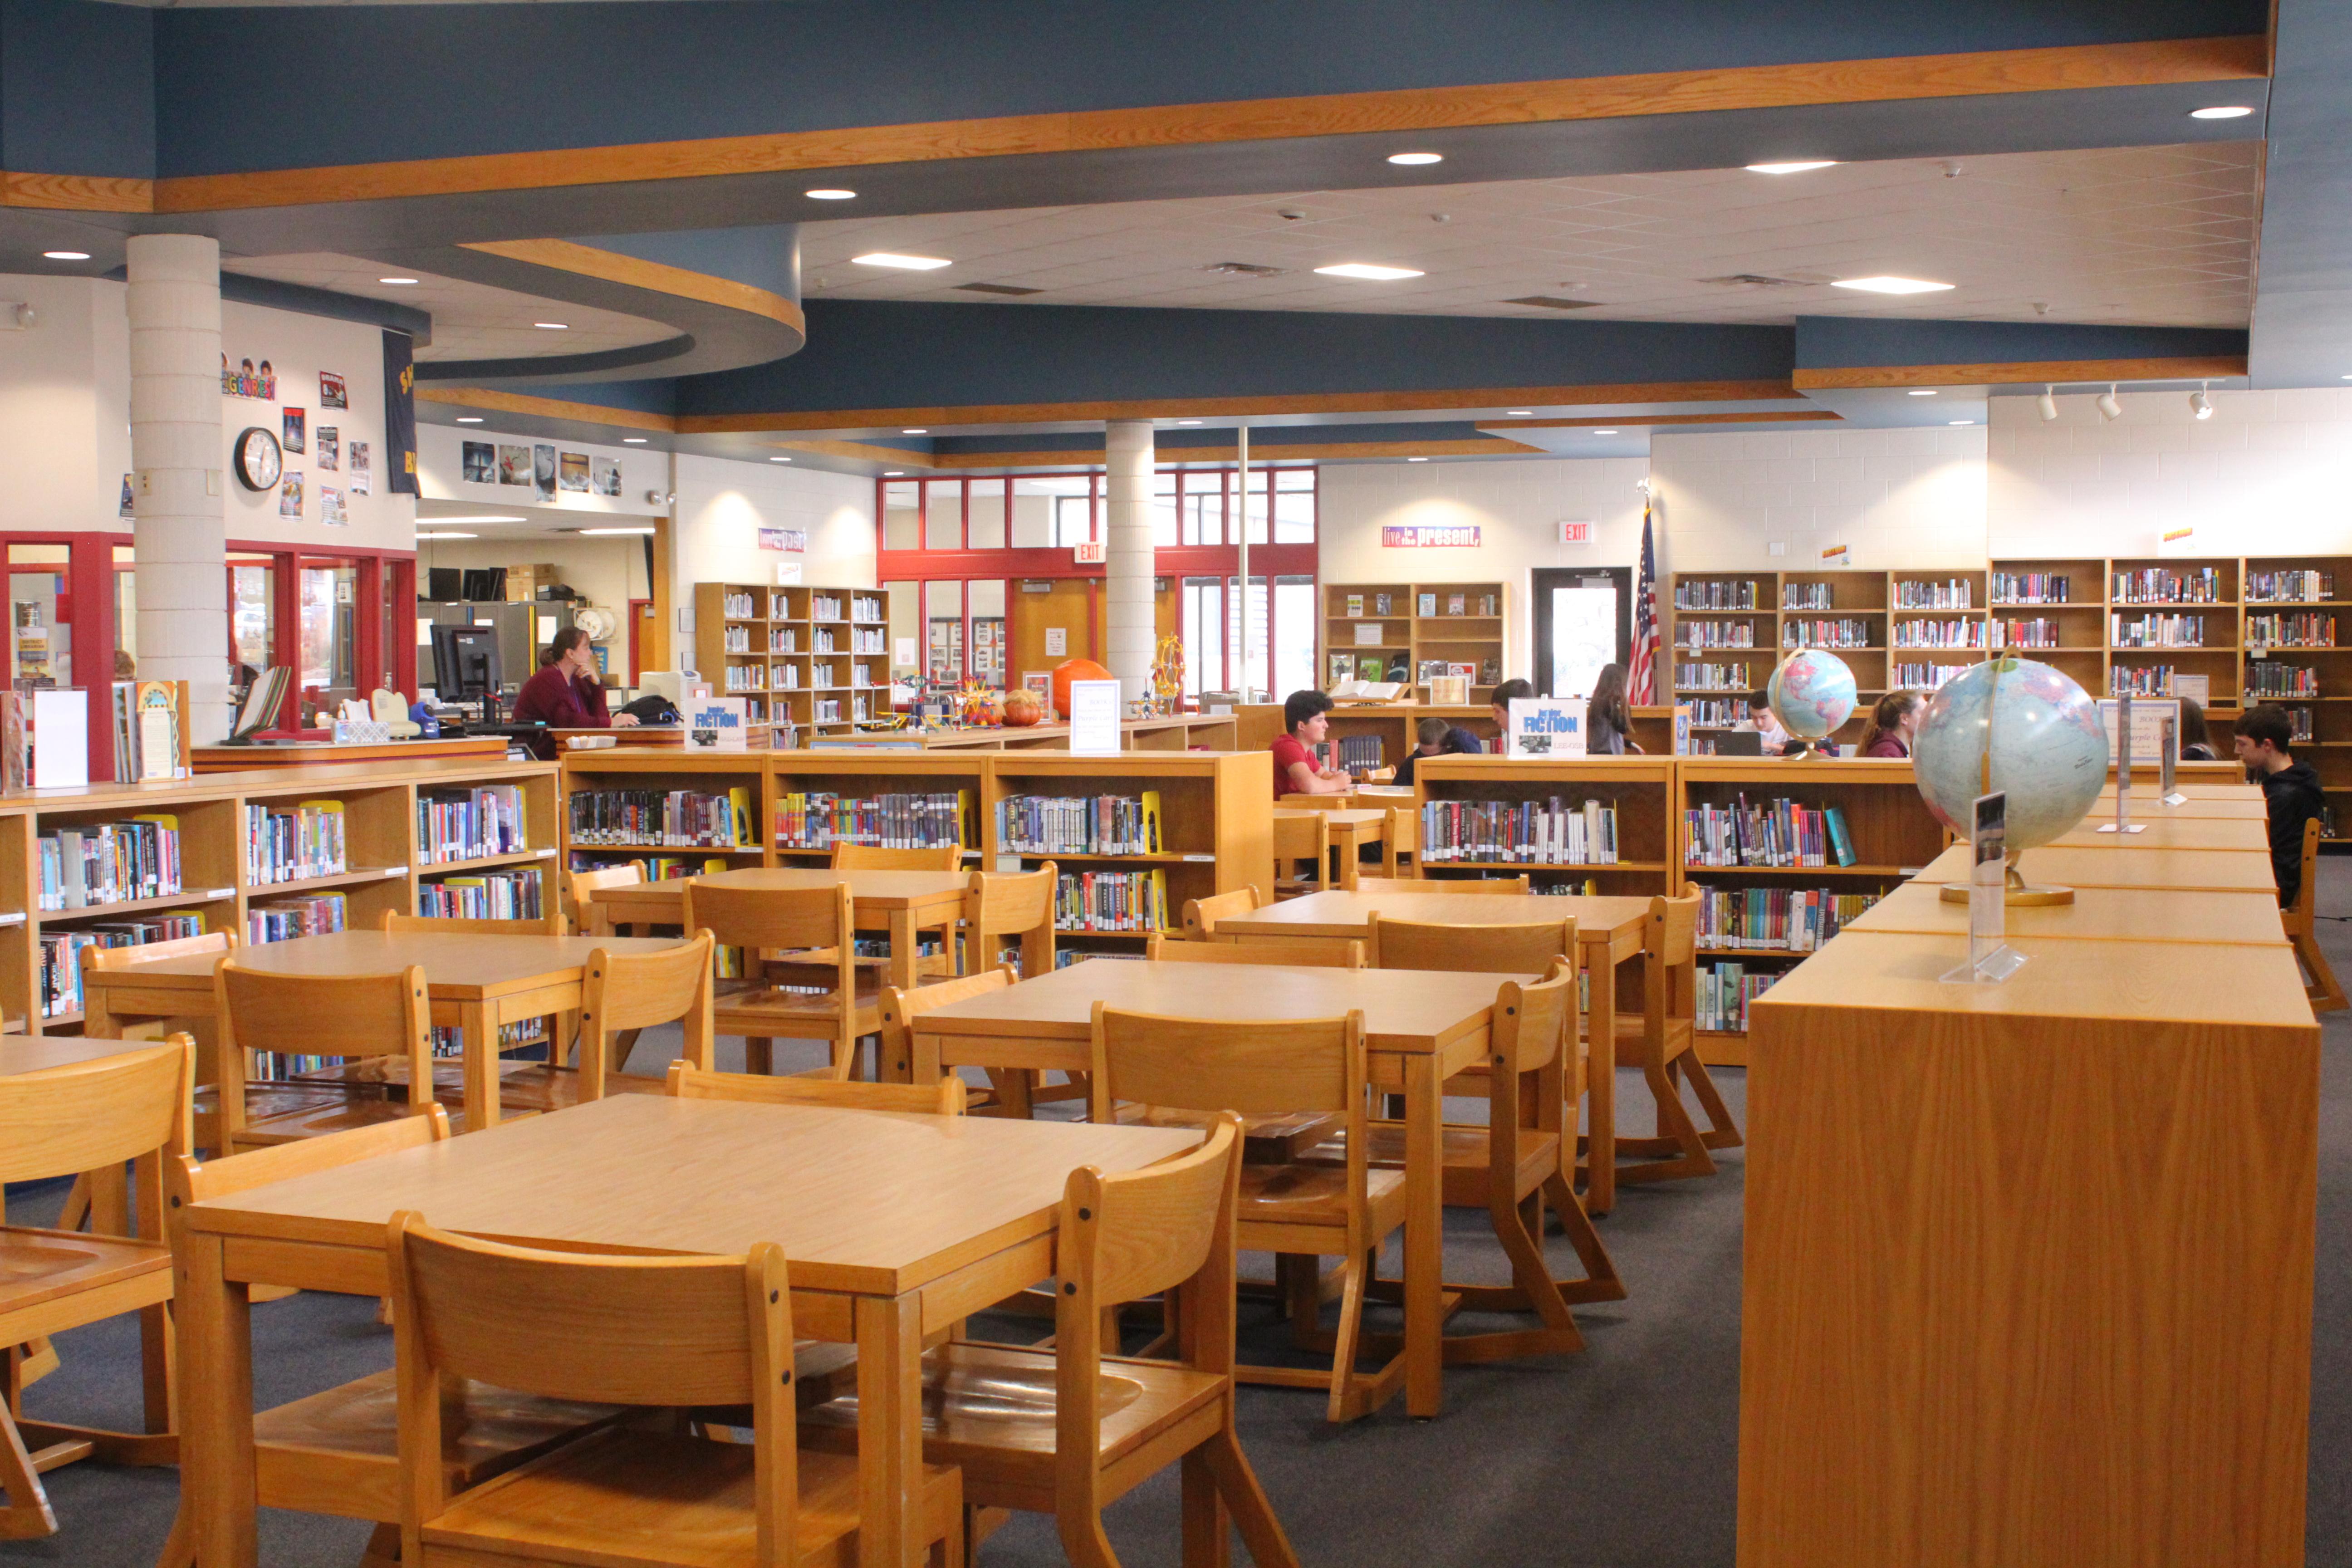 Secondary Media Center